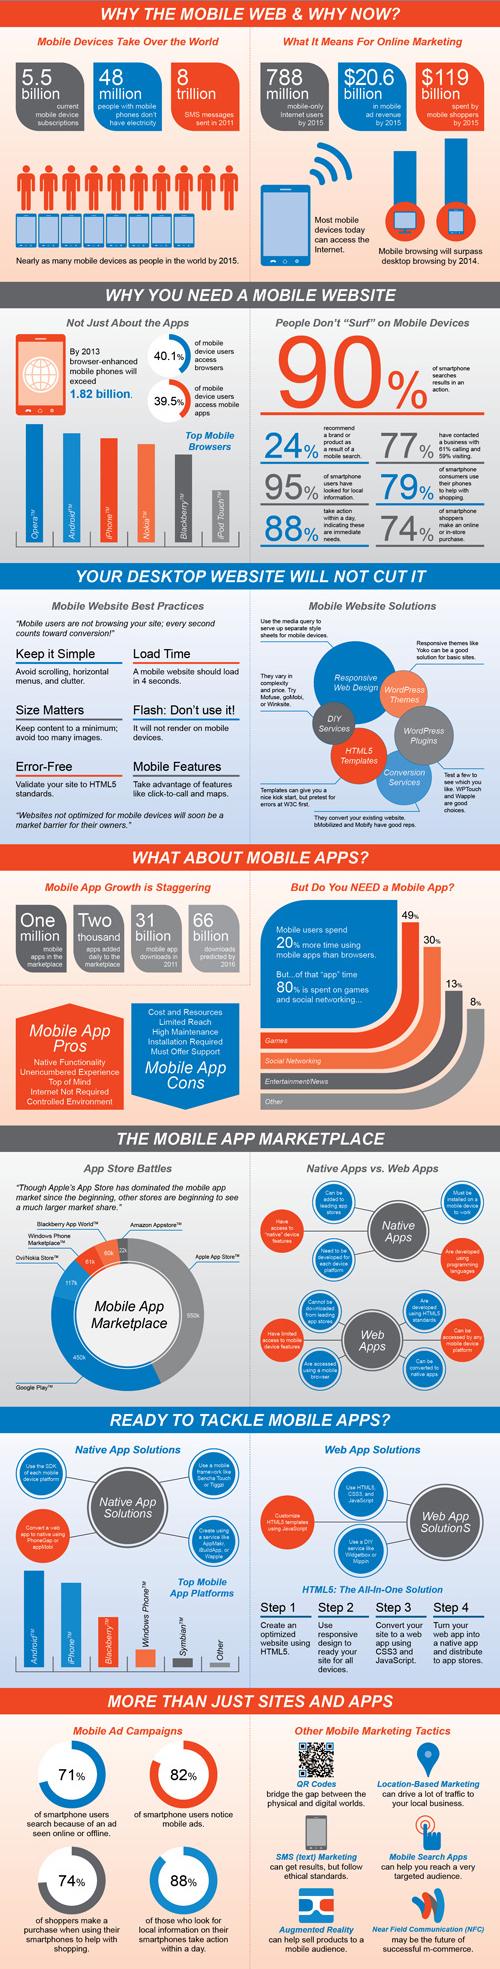 INFOGRAPHIC - Mobile Websites - Internet Marketing - Online Marketing - Small Business Marketing Toronto